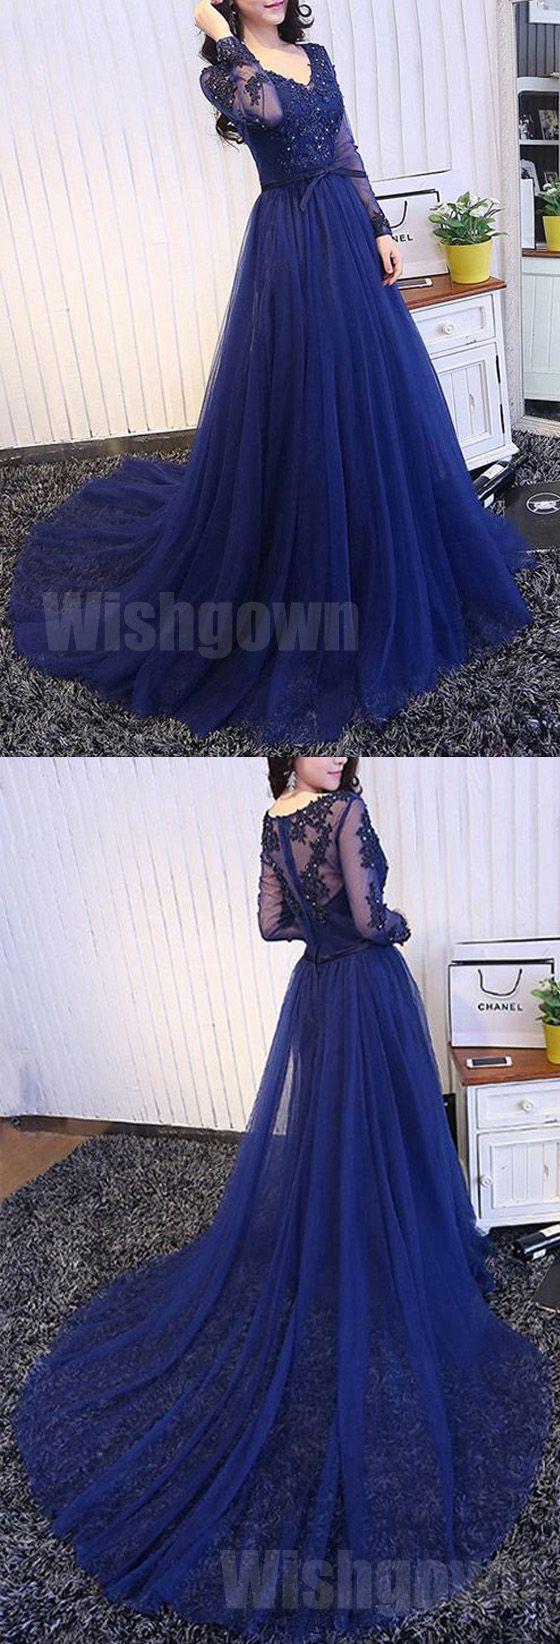 Royal blue long sleeves tulle elegant cheap long prom dresses